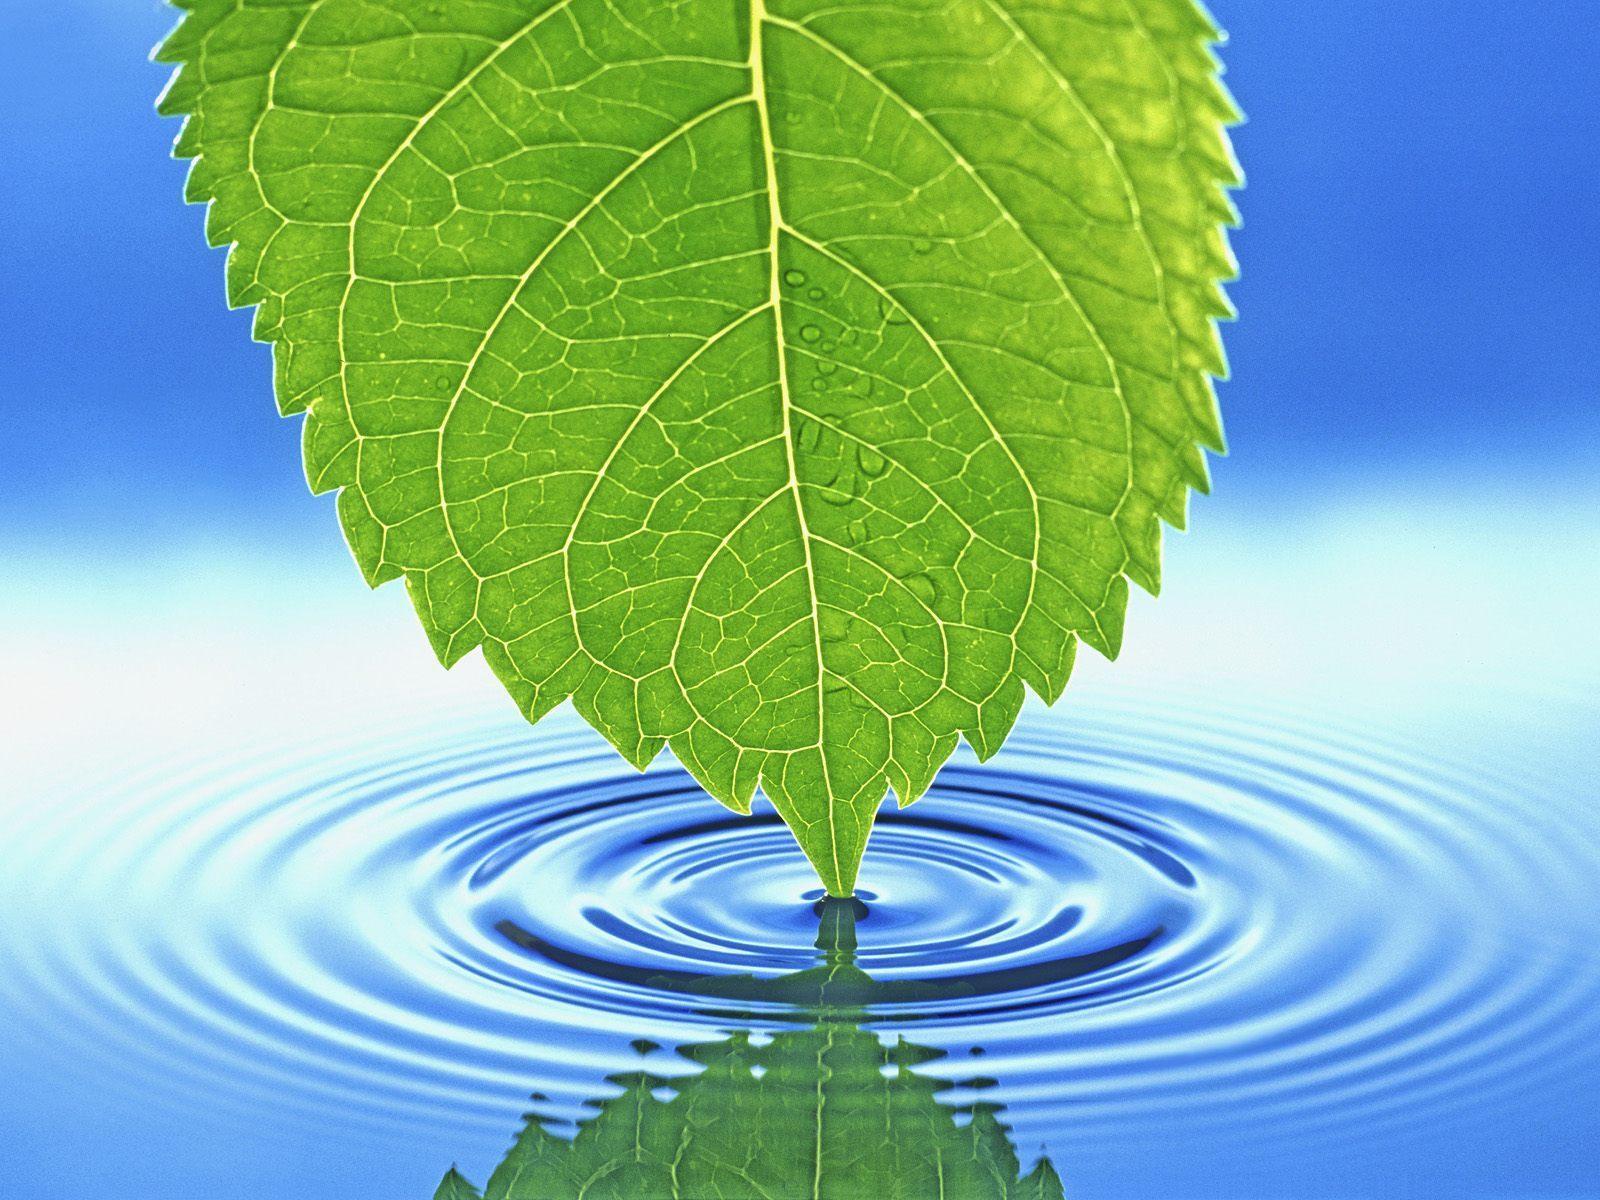 Nature_Seasons_Summer_Leaf_touching_water_007266_